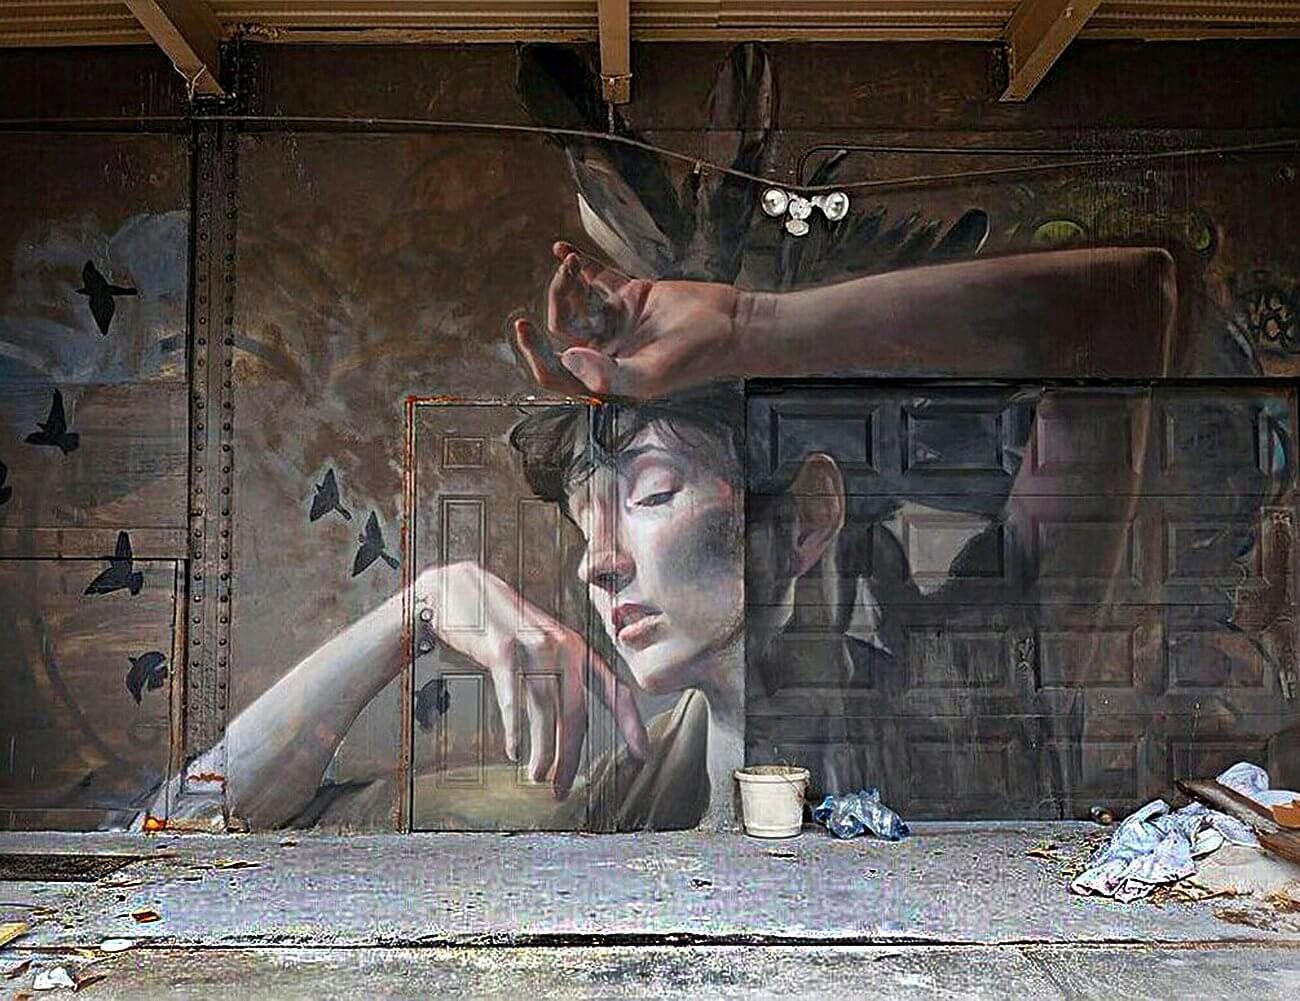 best-of-street-art-2018-ancien-classique.jpg